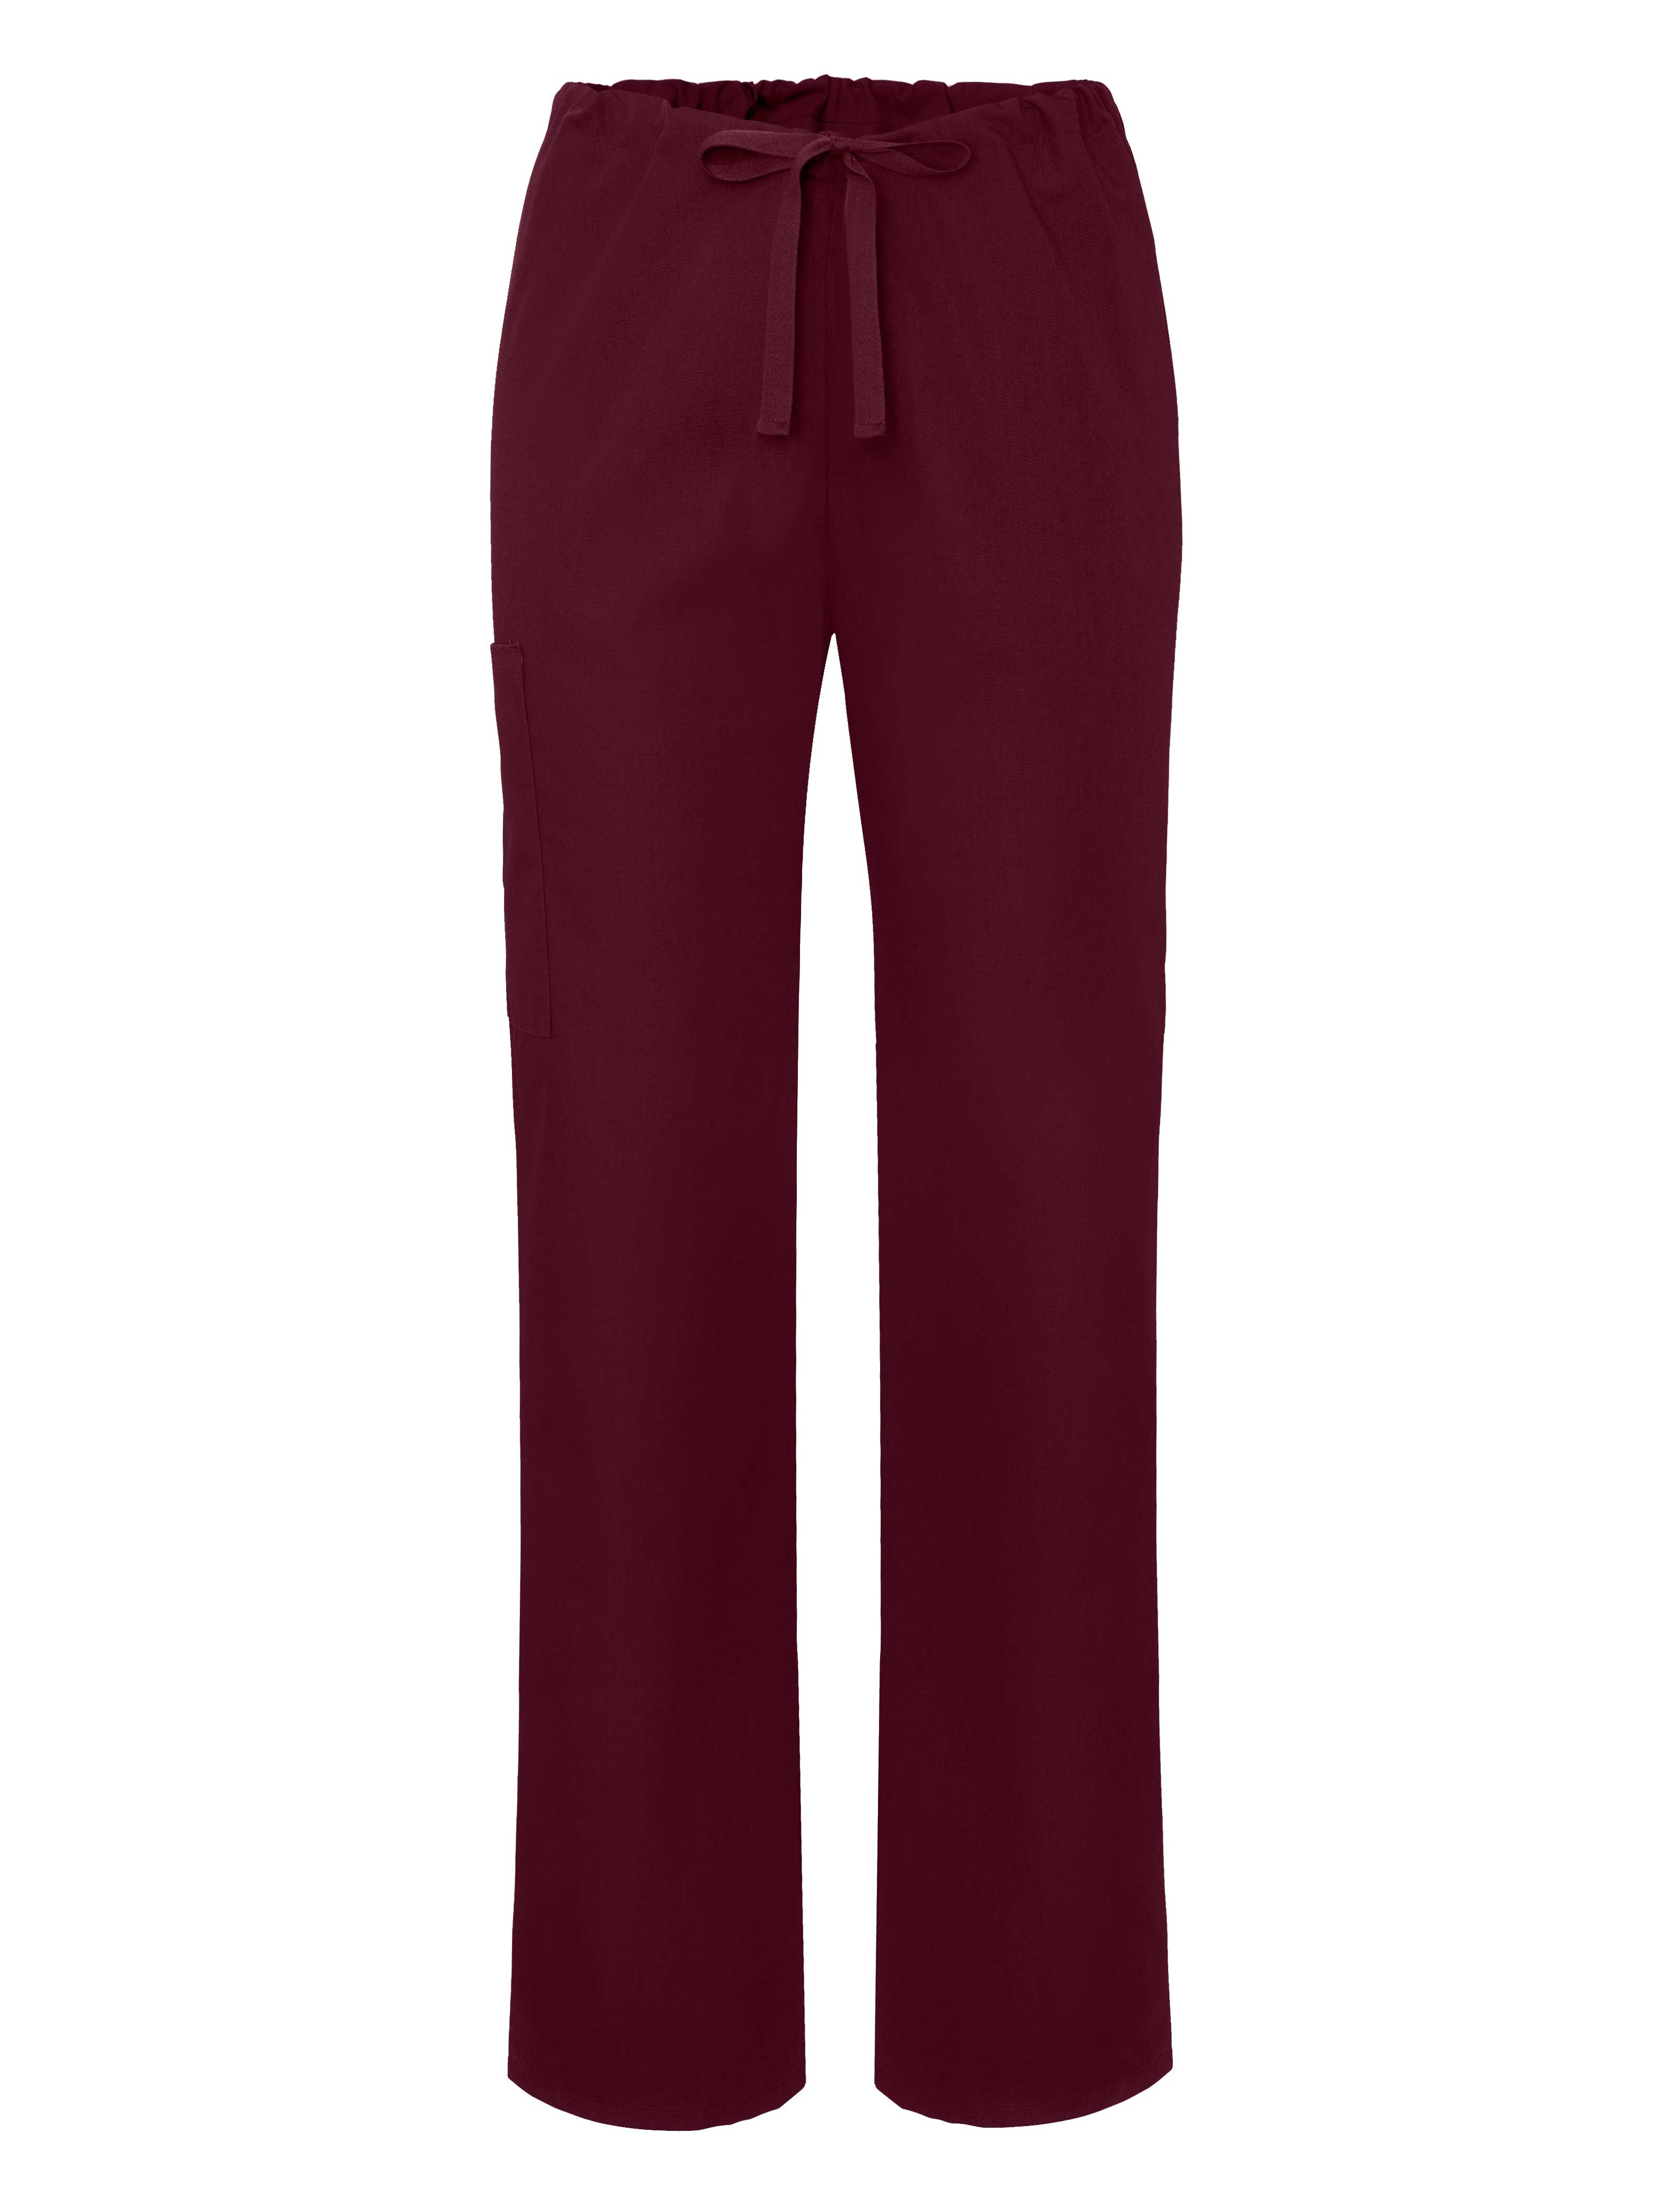 Adar Universal Unisex Natural-Rise Drawstring Tapered Leg Pants - 504 - Black - 5X